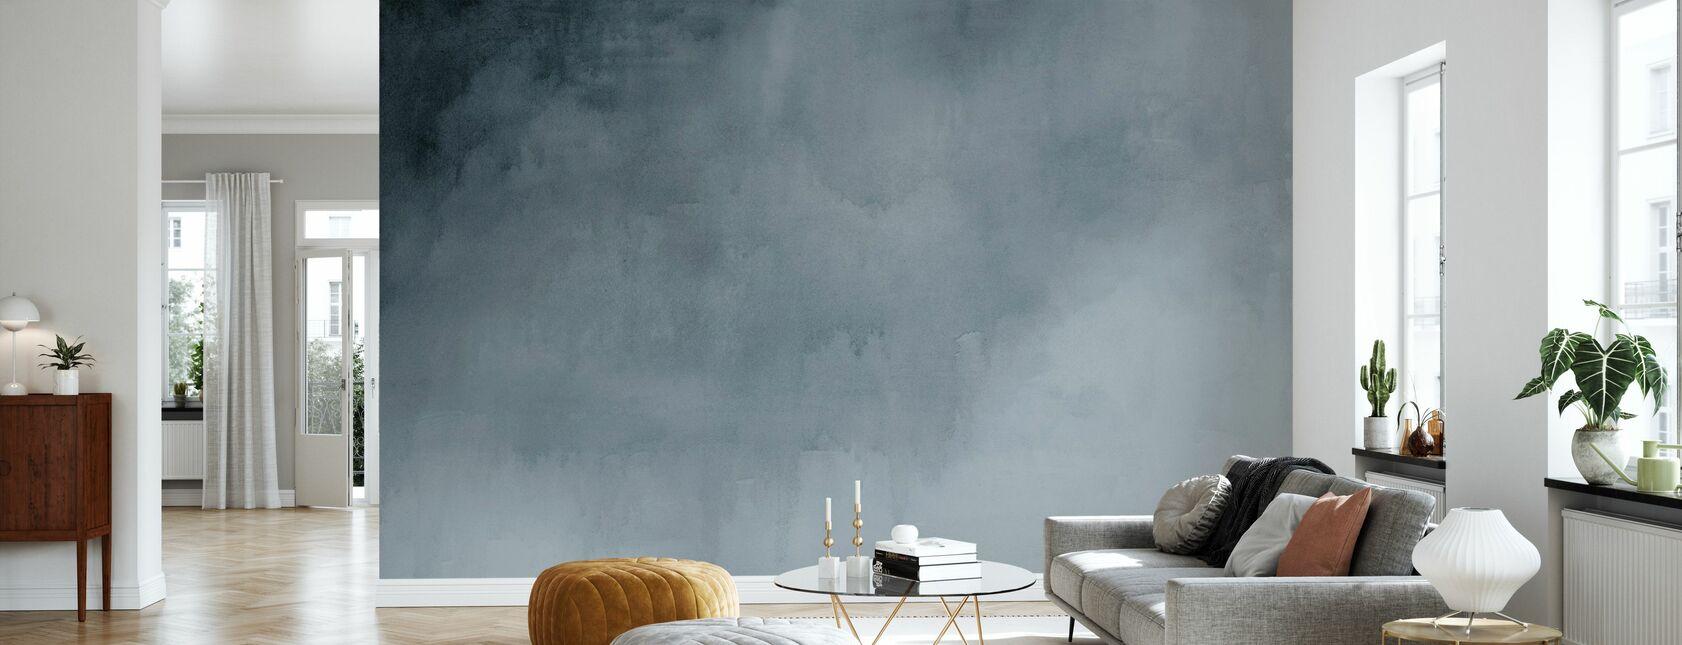 Watercolour - Paynes Grey - Wallpaper - Living Room